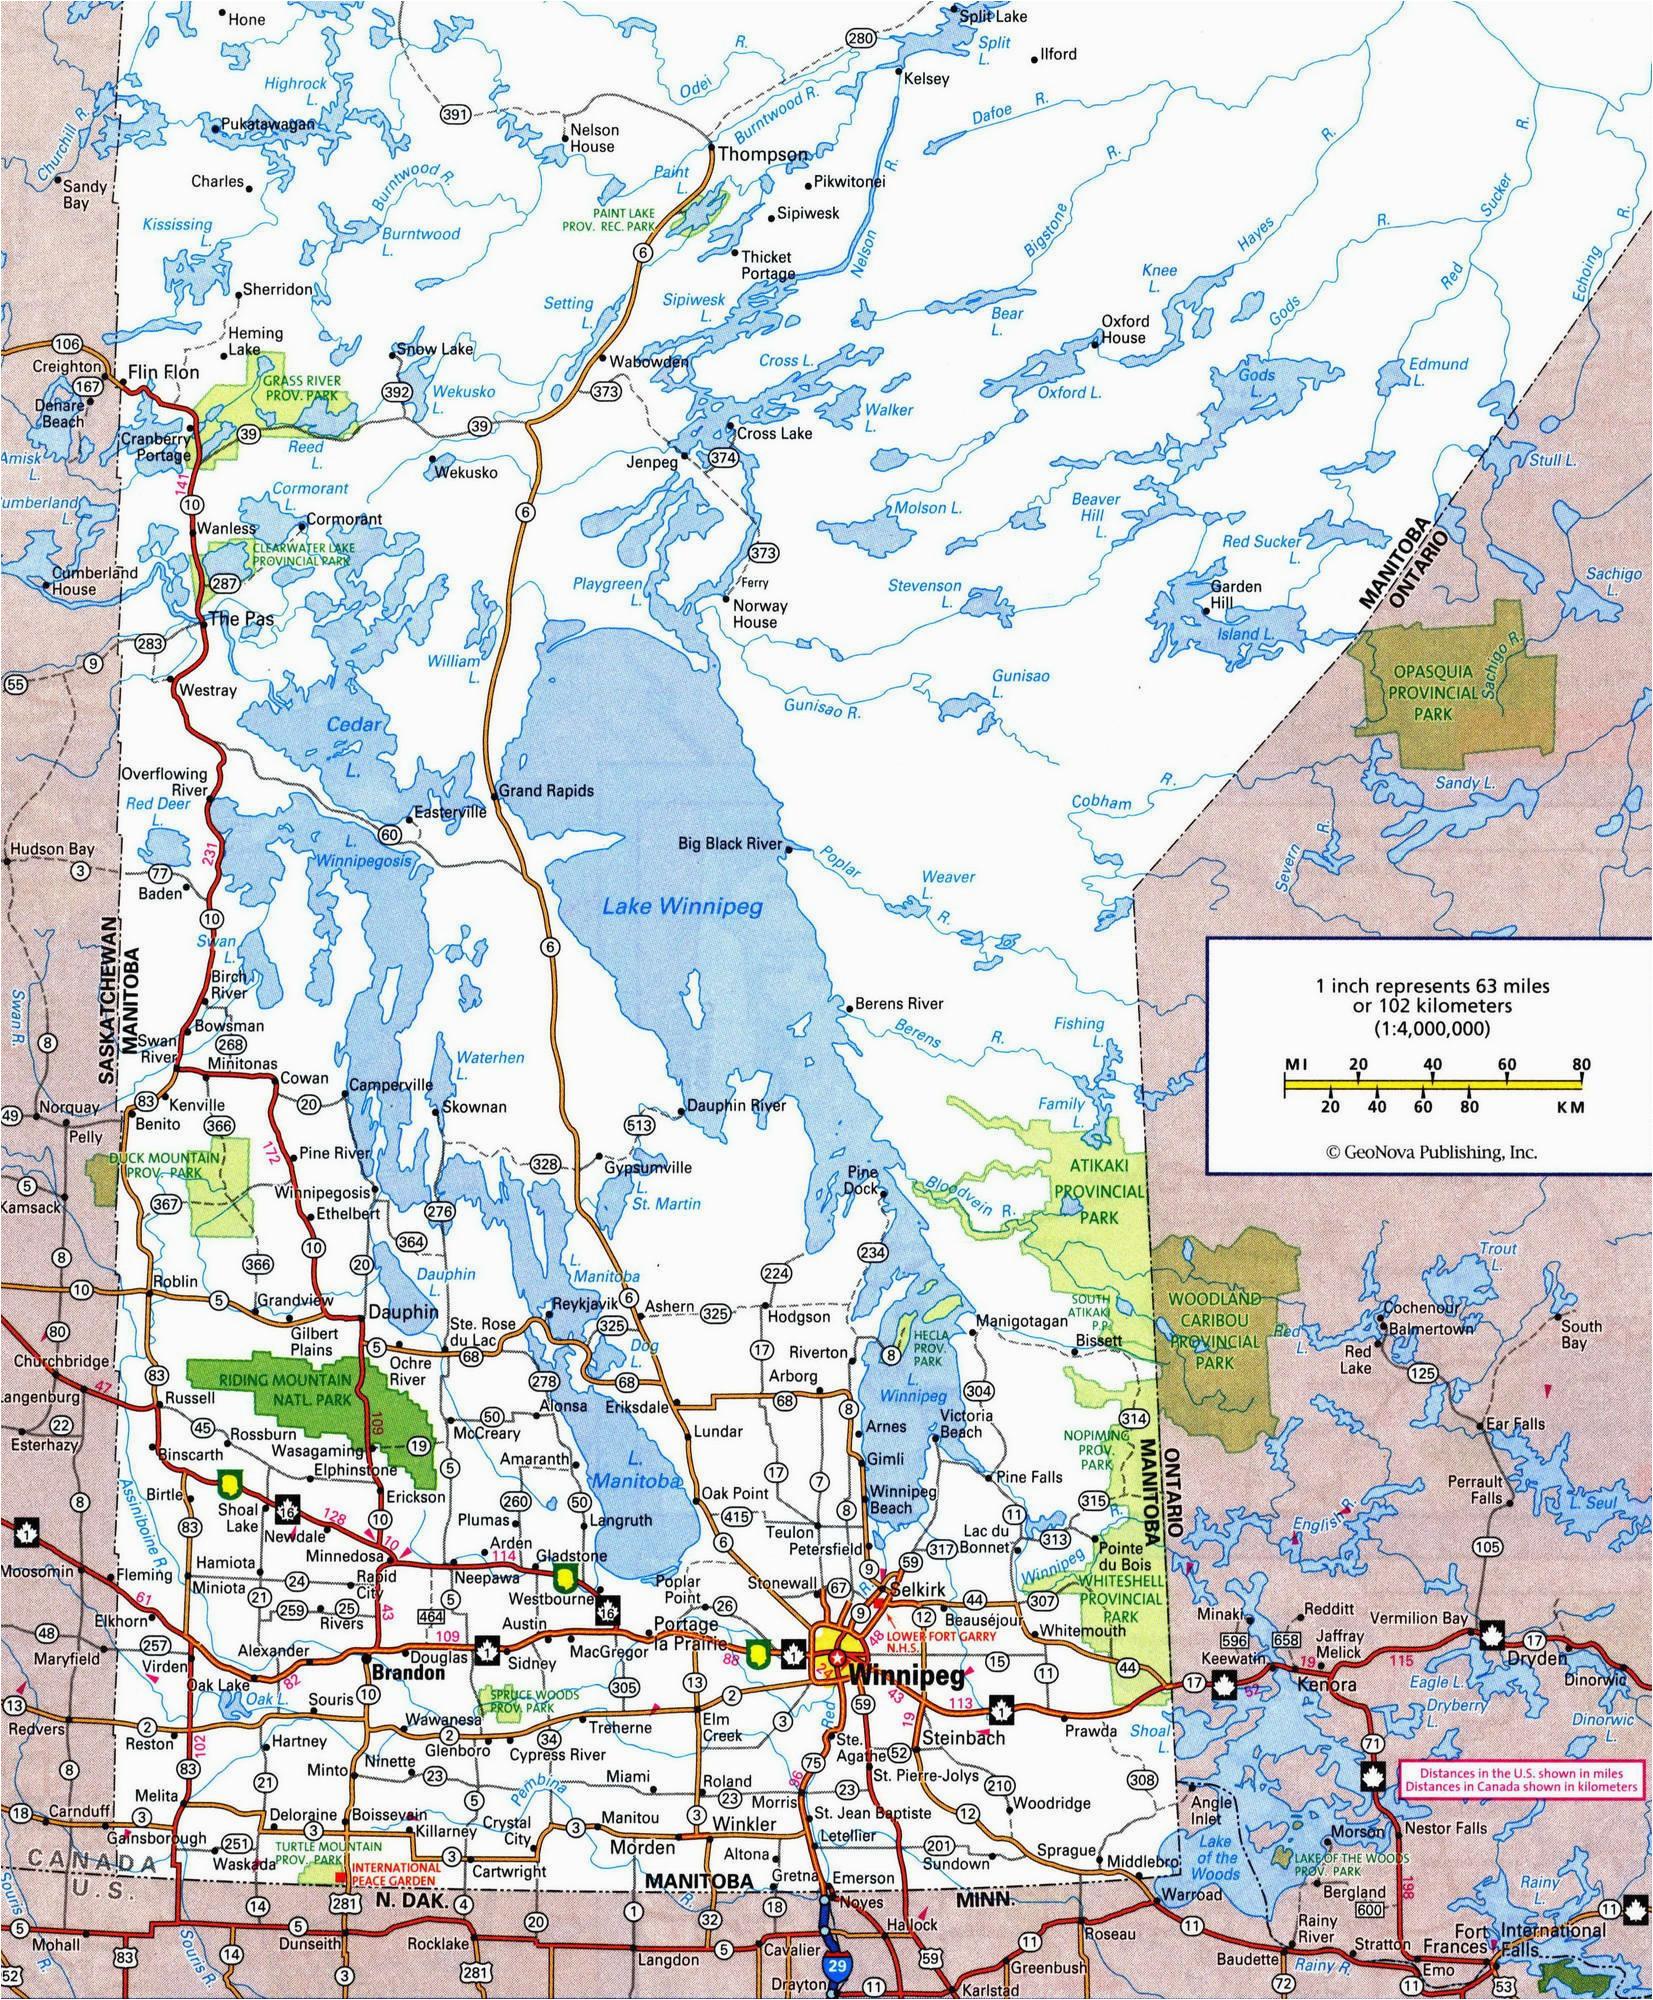 pueblo colorado usa map valid mb roads map download wallpaper high